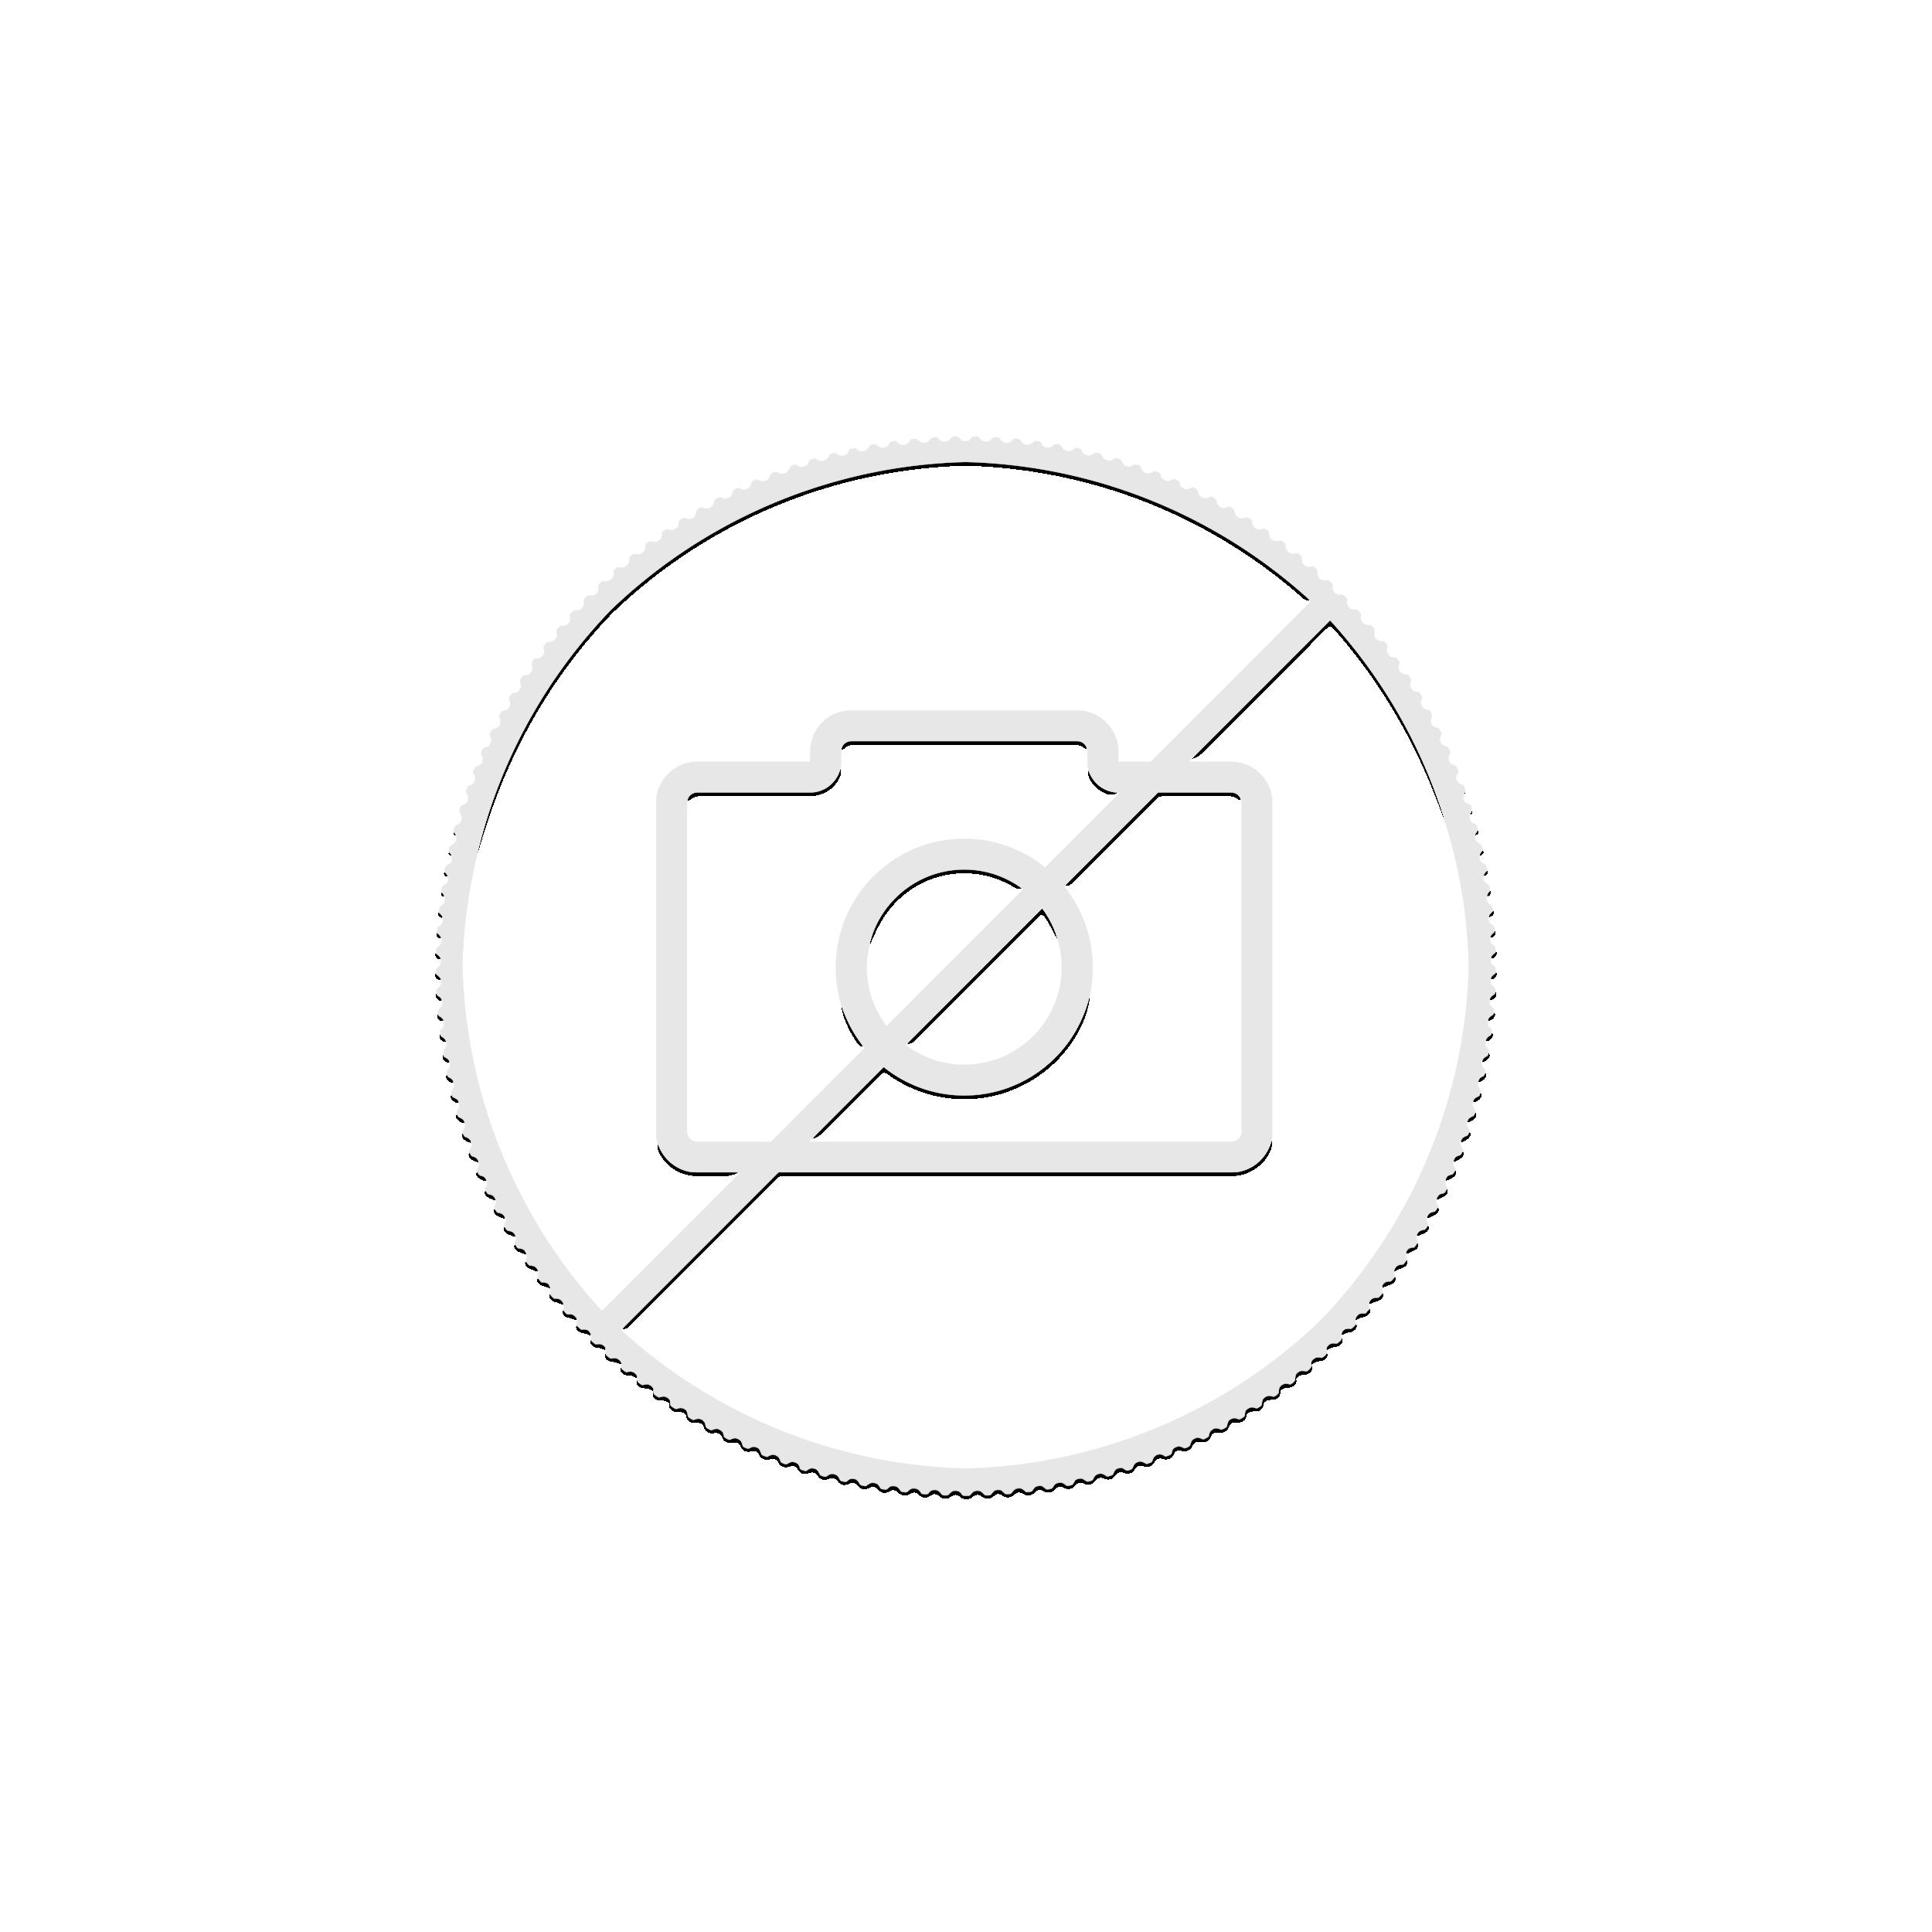 1 Kilo Koala zilver munt 2009